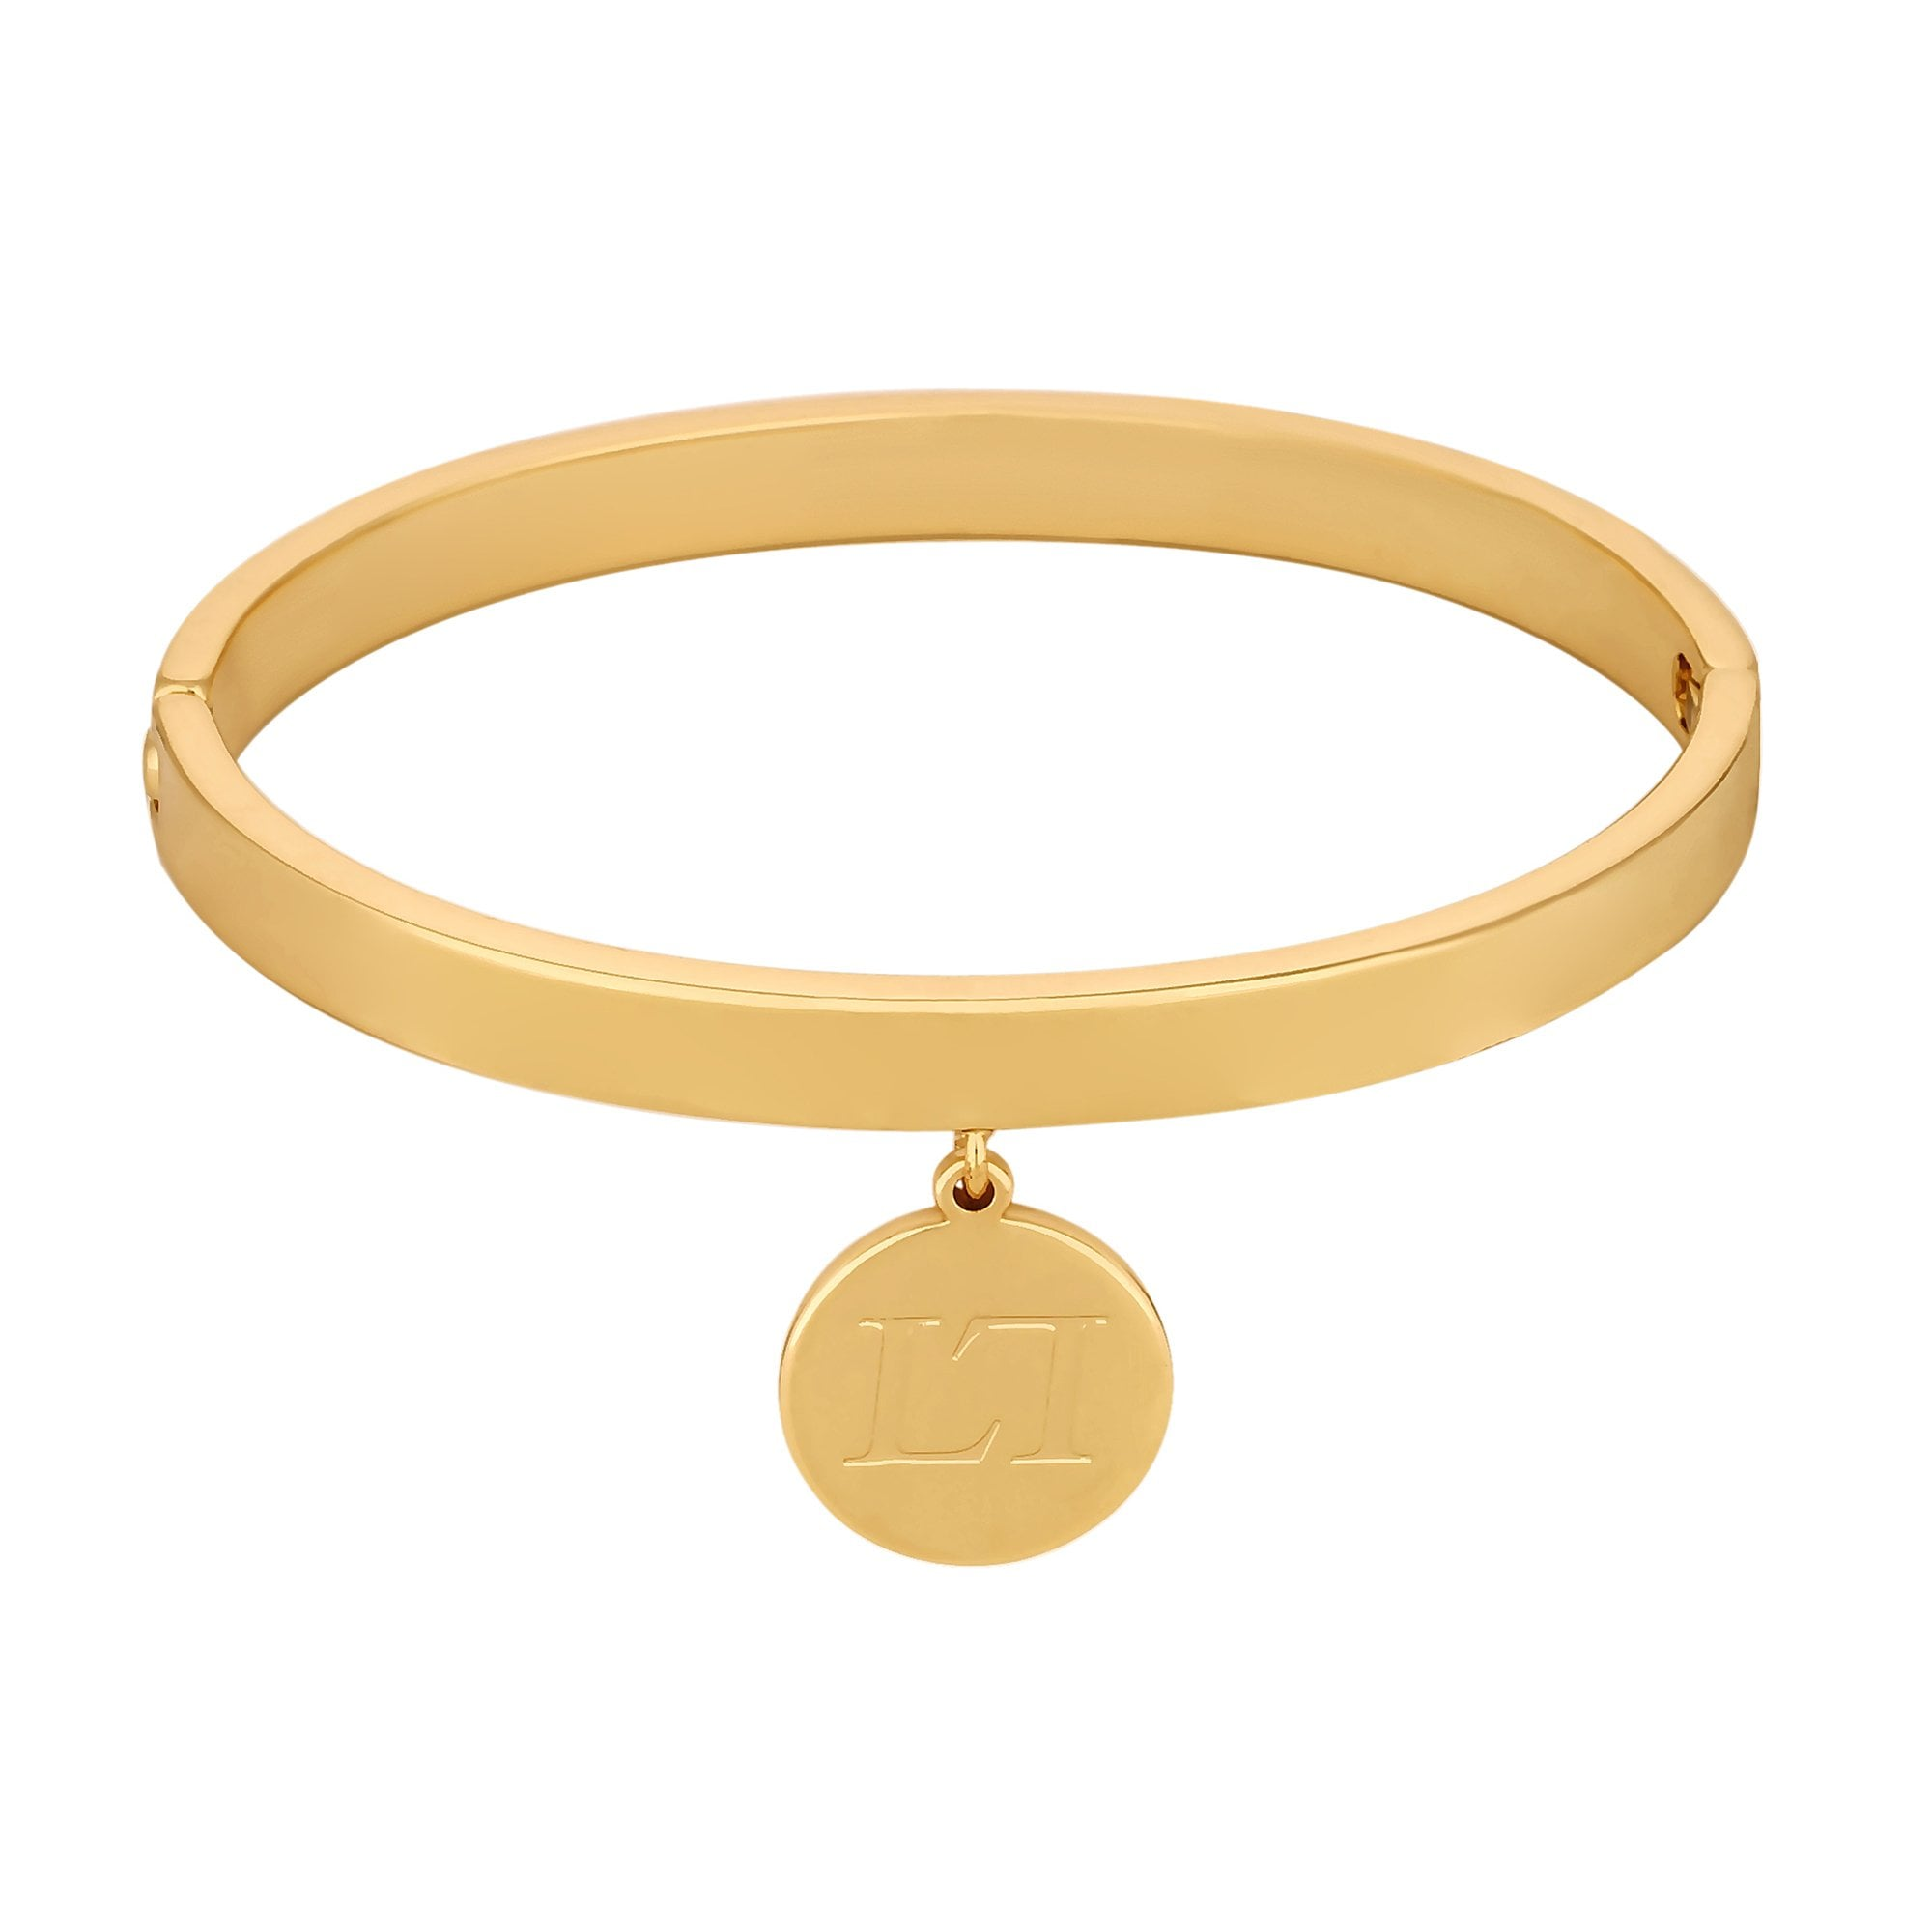 9babb2c95c9 Lipsy Gold Coin Charm Bangle - Jewellery from Jon Richard UK